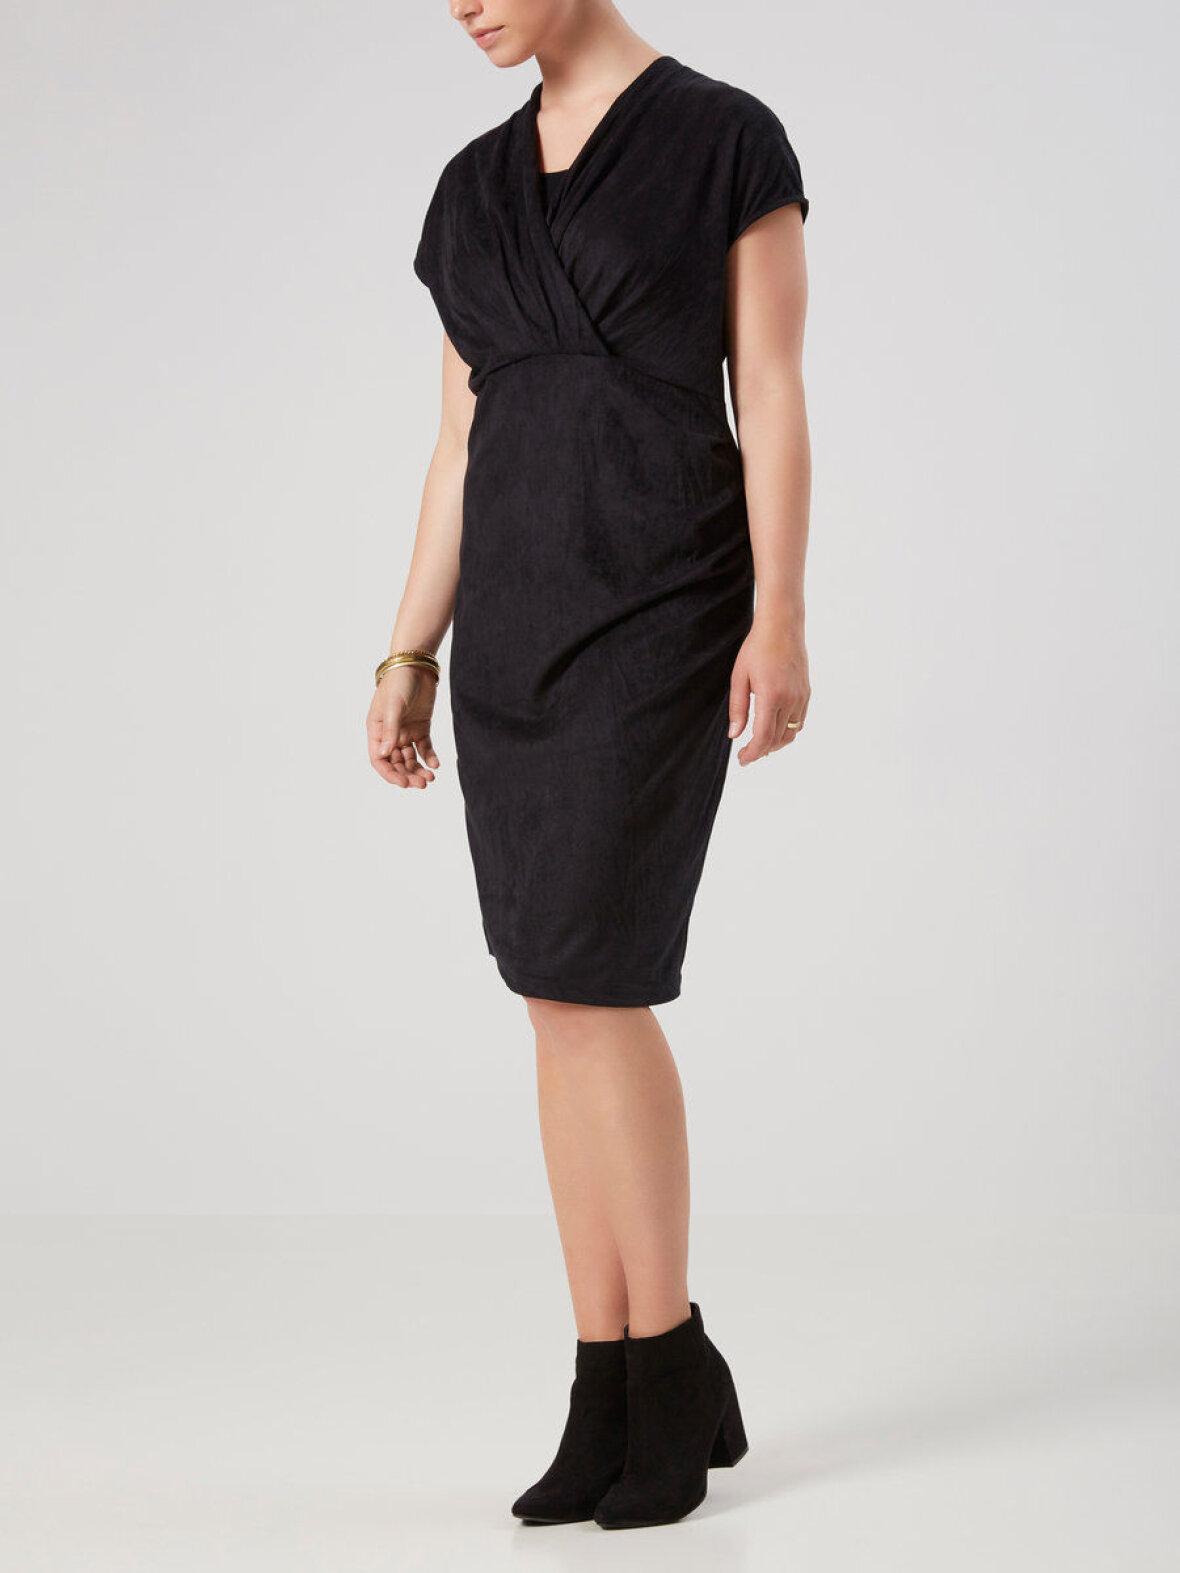 041585b7e906 Enula9 - Ammevenlige kjoler - Mamalicious - Amme kjole